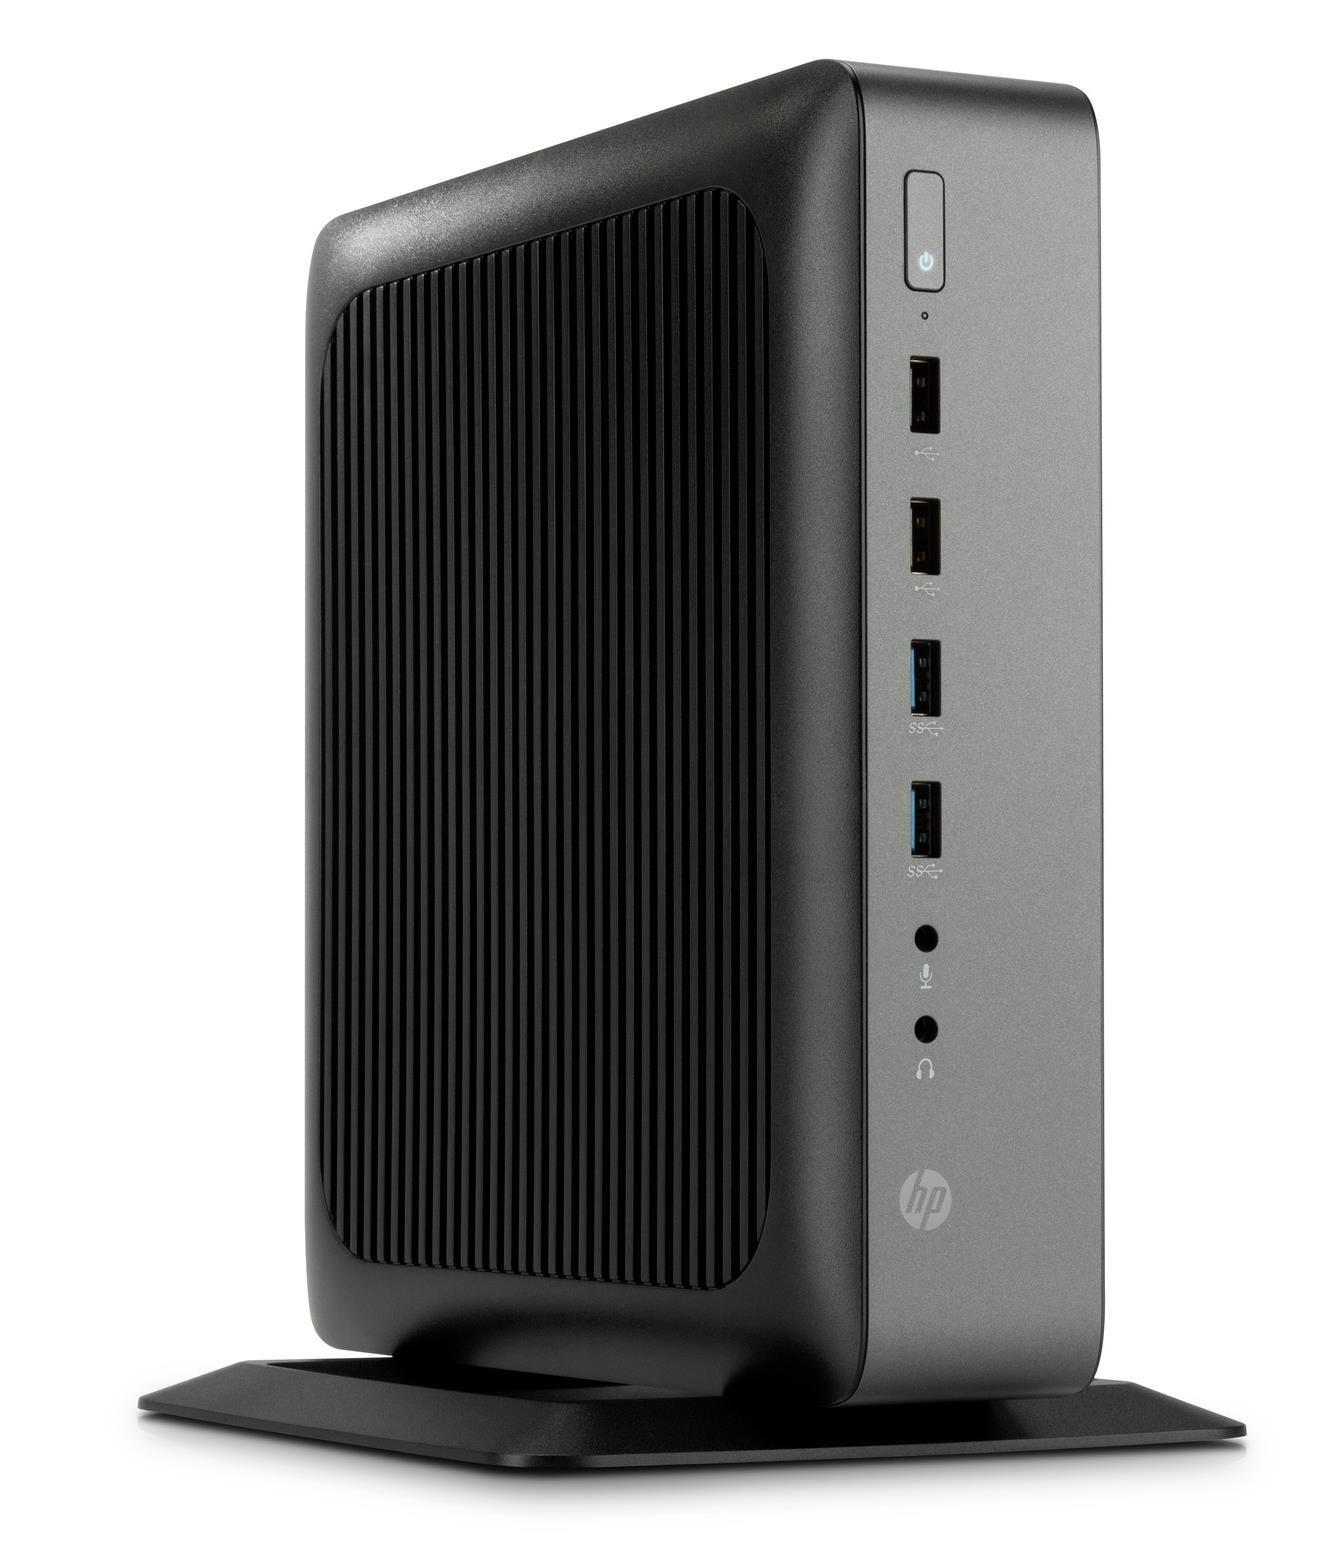 HP t620 PLUS Thin Client Quad Core (GX-420CA) 2.0GHz 4GB 16GB SSD LAN Windows Embedded Standard 7E 32-bit (Radeon HD 8400E)